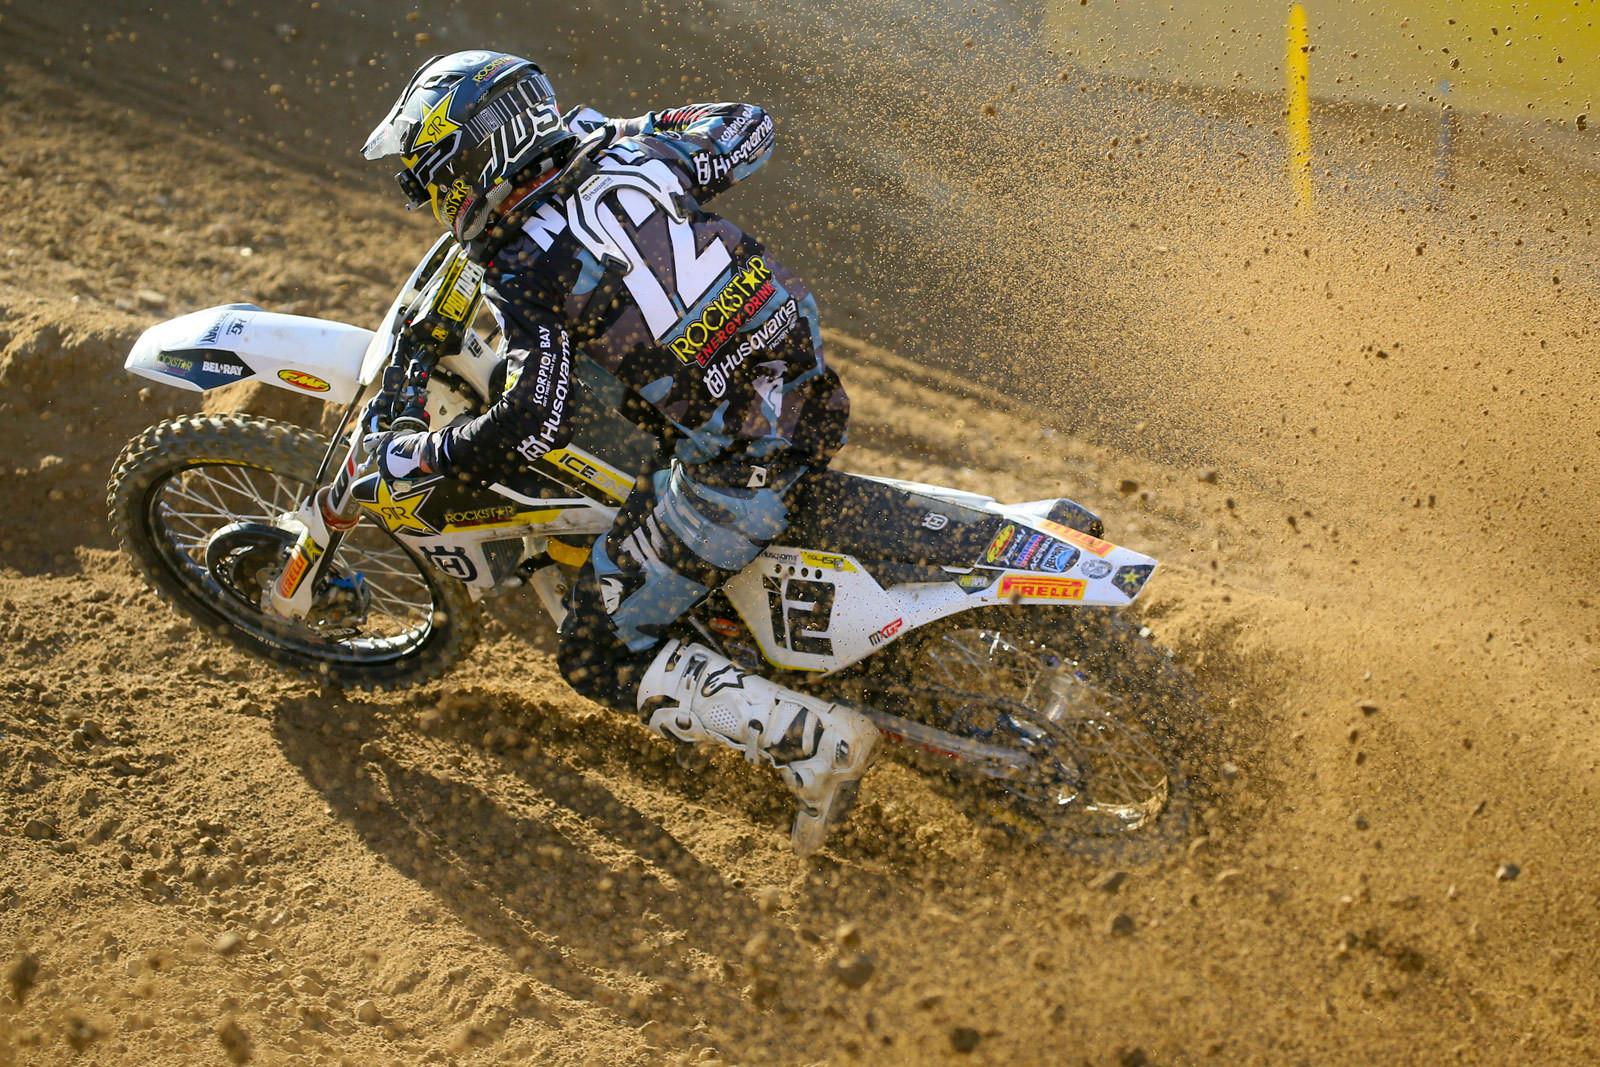 Max Nagl - Photo Blast: MXGP of the USA - Motocross Pictures - Vital MX